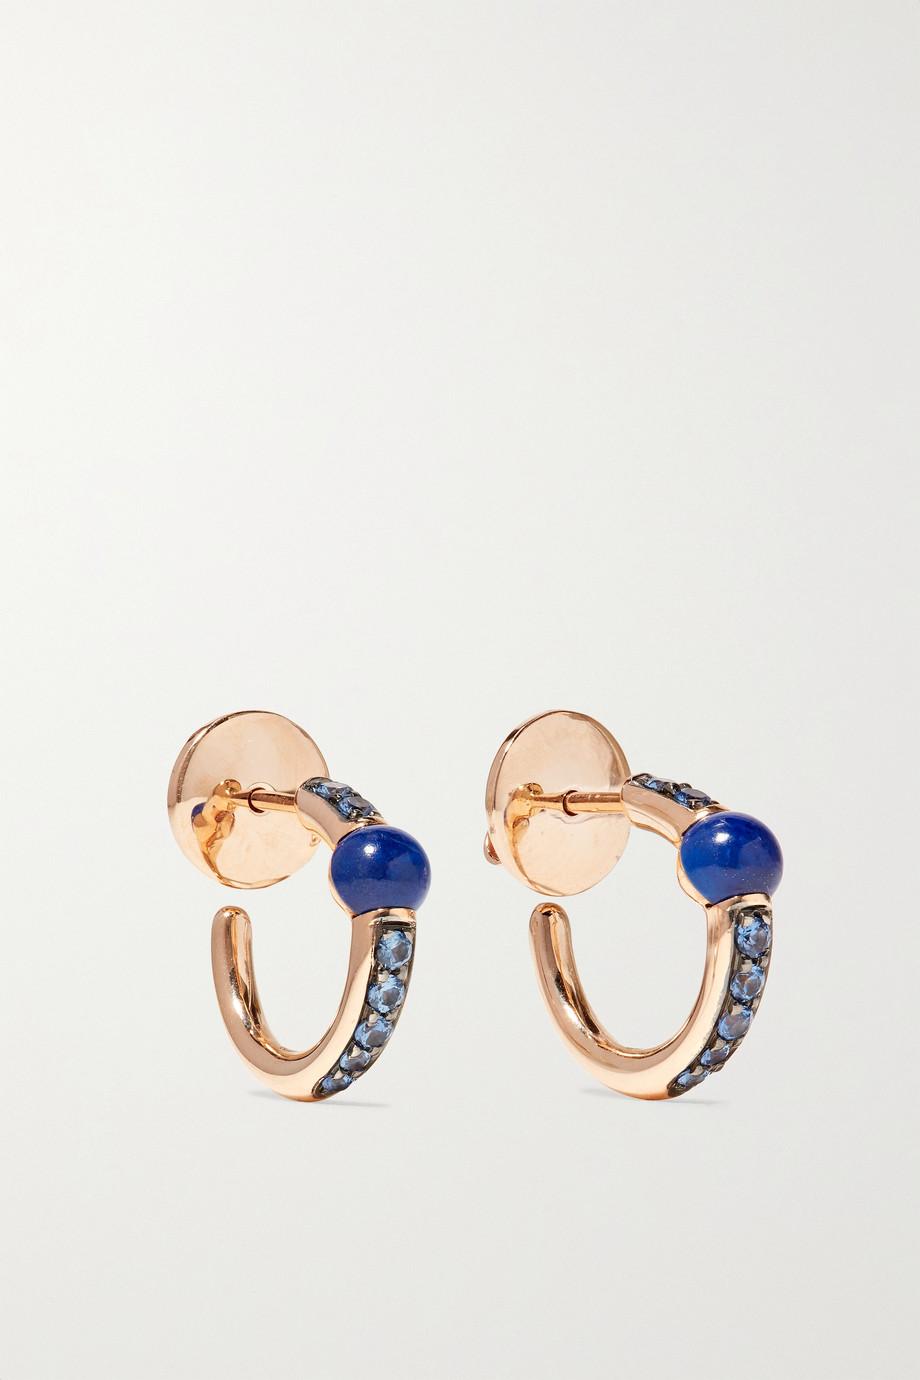 Pomellato M'ama non M'ama 18-karat rose gold, lapis lazuli and sapphire hoop earrings